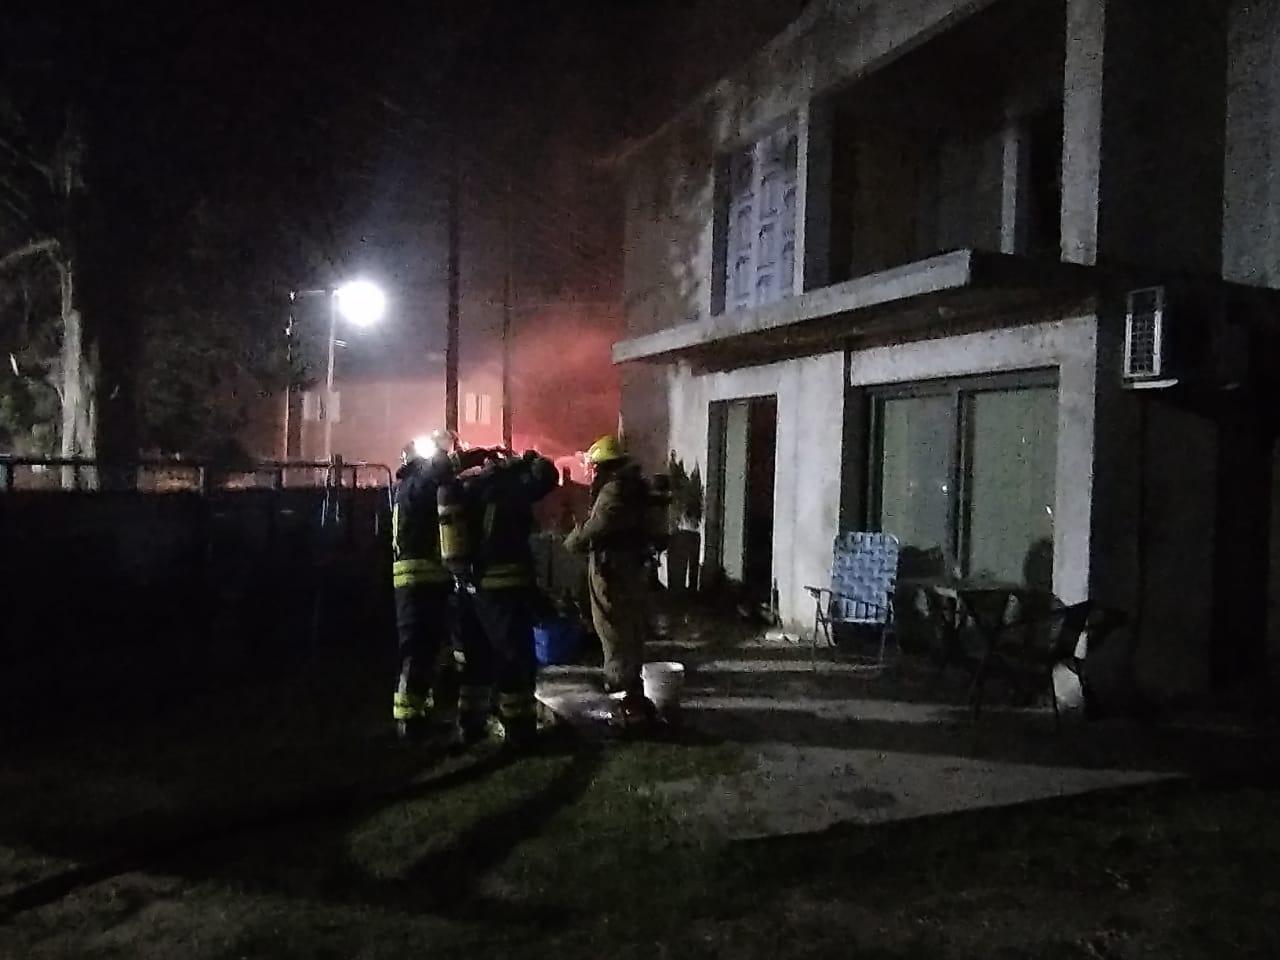 Incendio de vivienda en Embalse 08